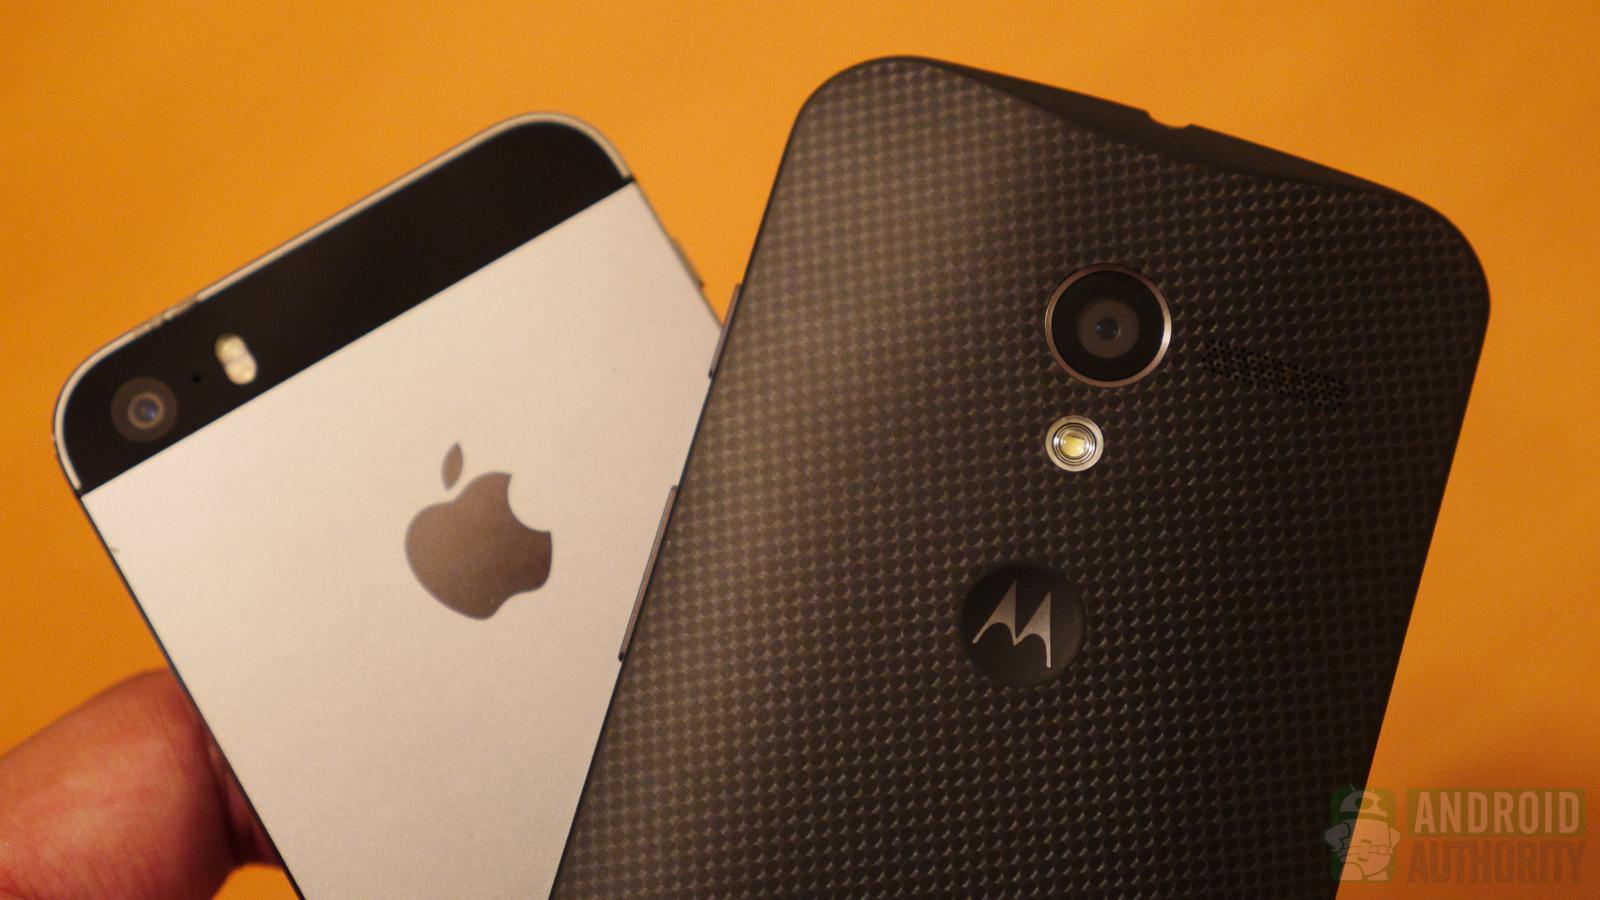 Is Motorola correct in predicting the death of premium smartphones?